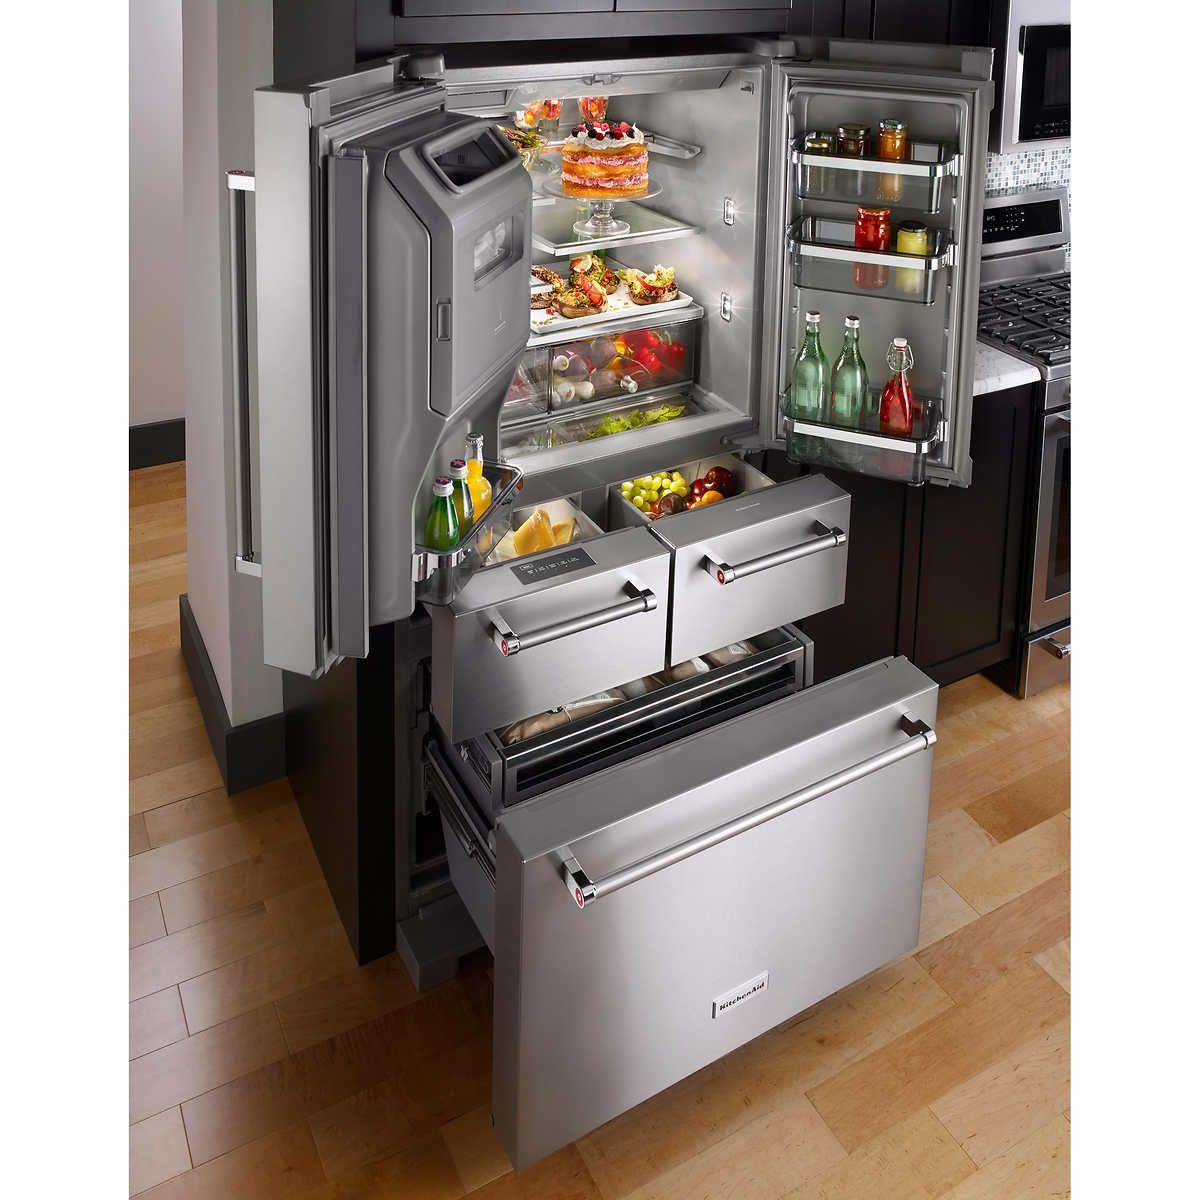 Kitchenaid 25 8cuft 36 Multi Door Freestanding Refrigerator With Platinum Interior Design Outdoor Kitchen Appliances Kitchen Renovation Kitchen Design